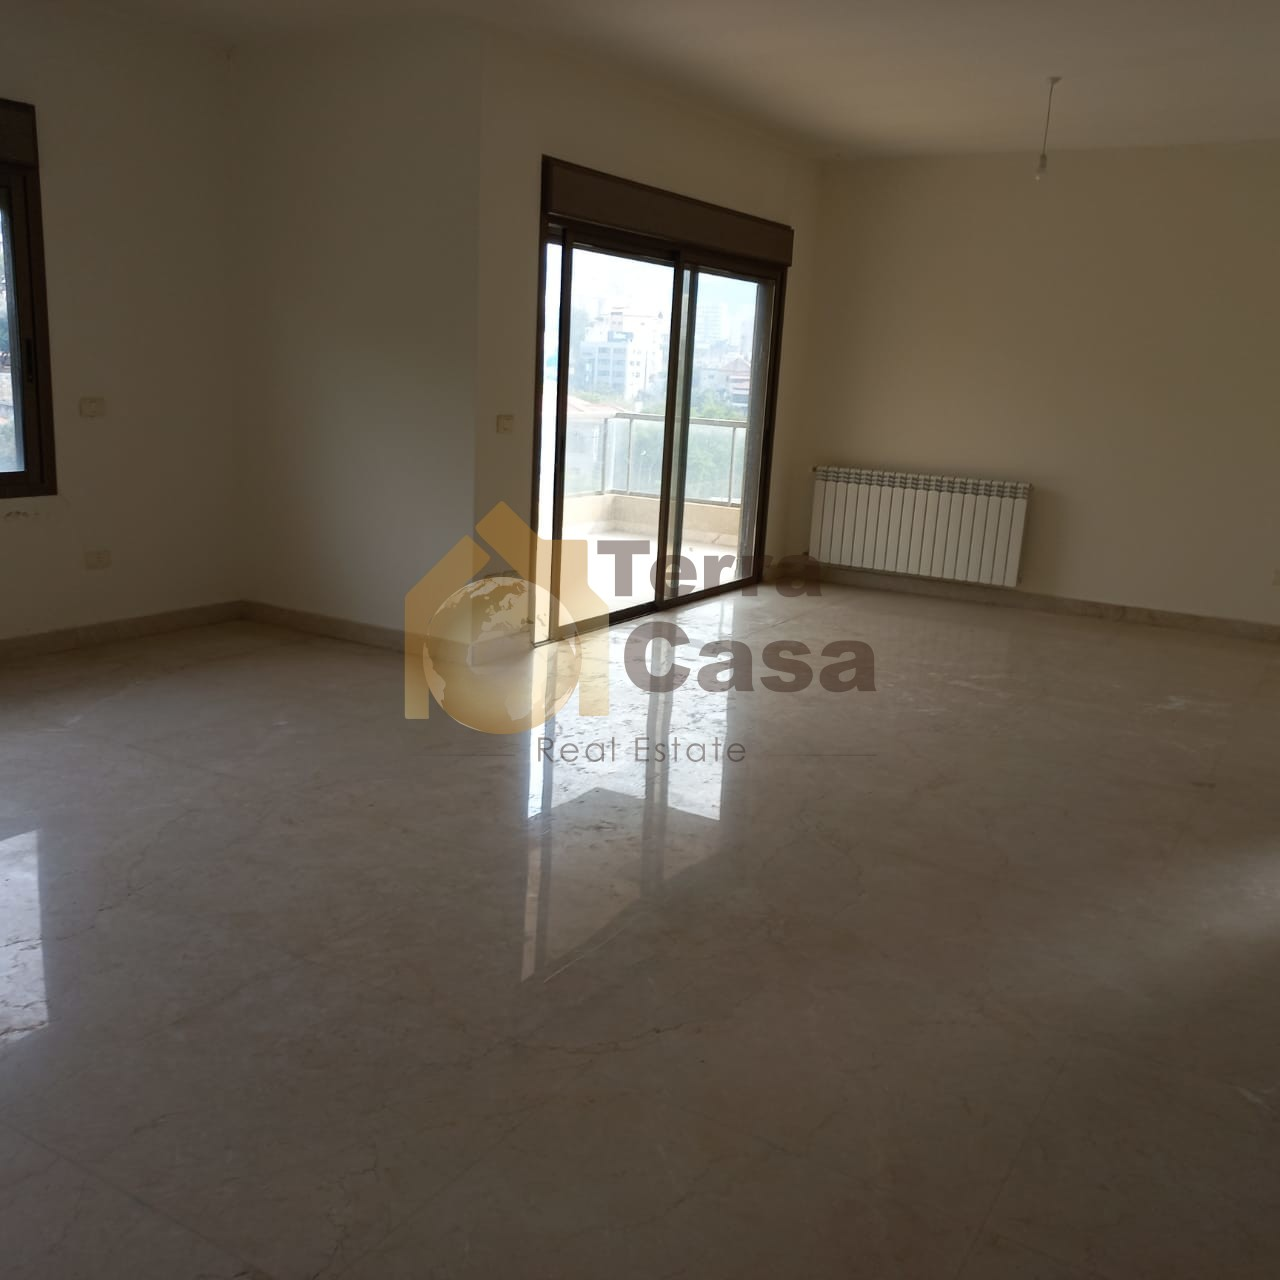 naqqache apartment open view cash payment